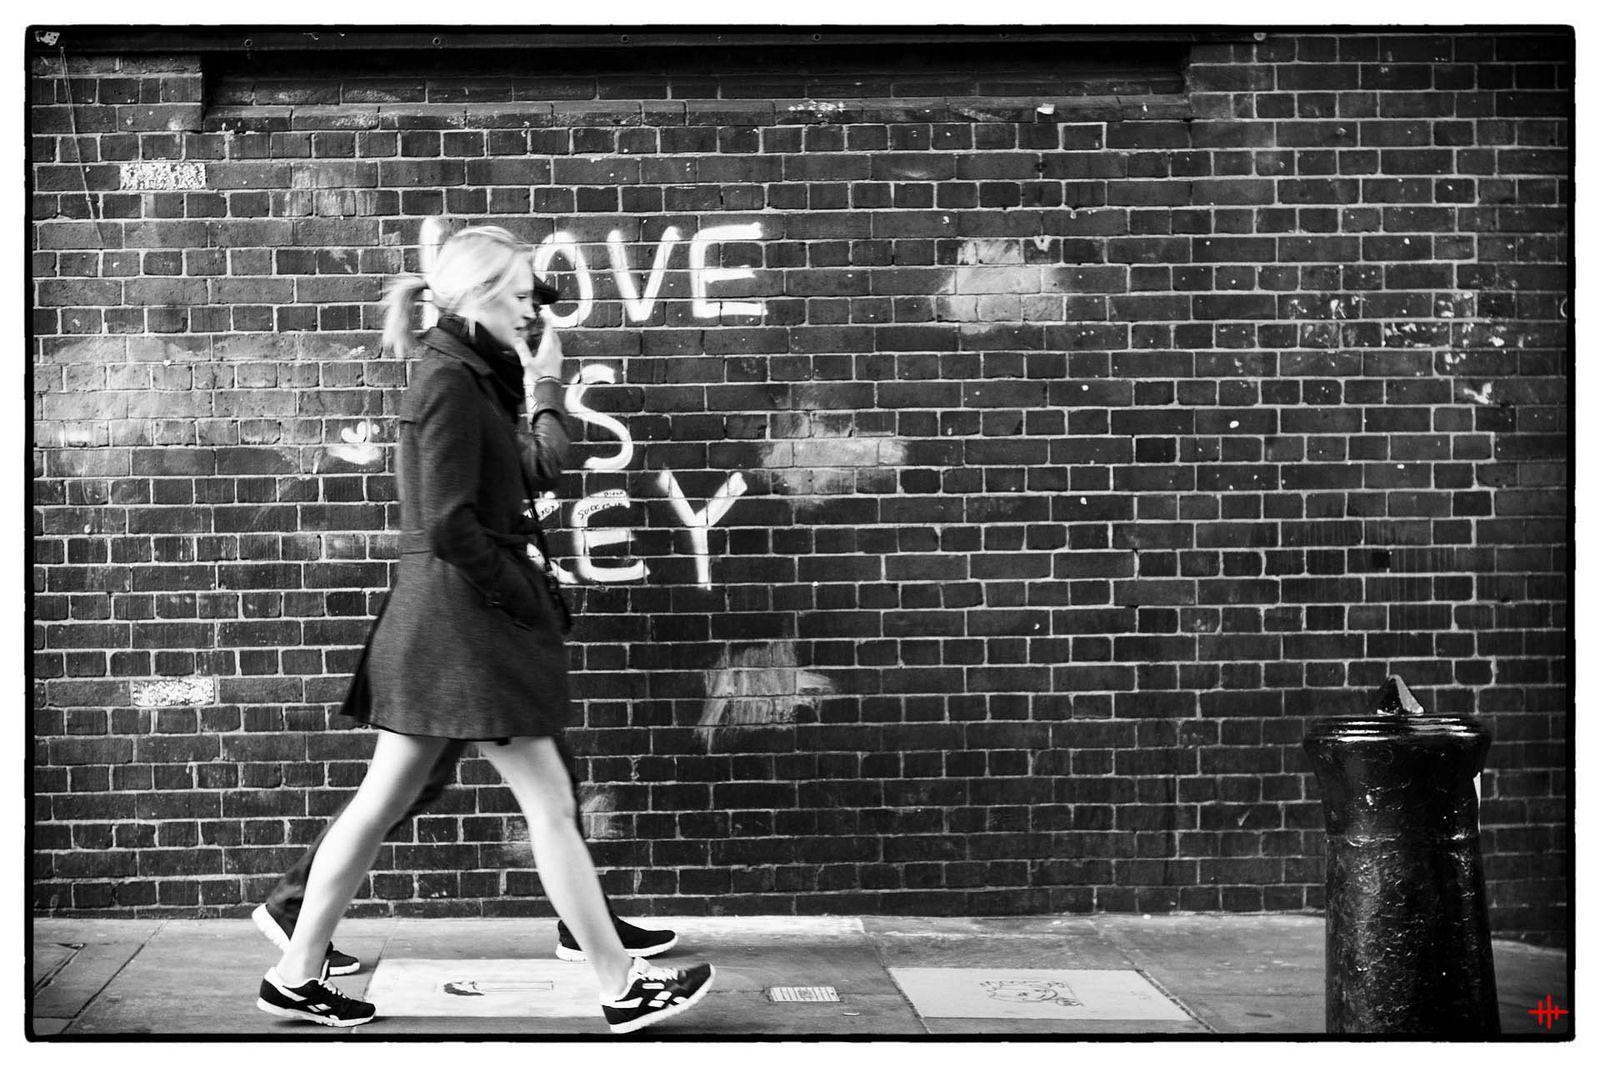 Street Photography - Brick Lane - mono log